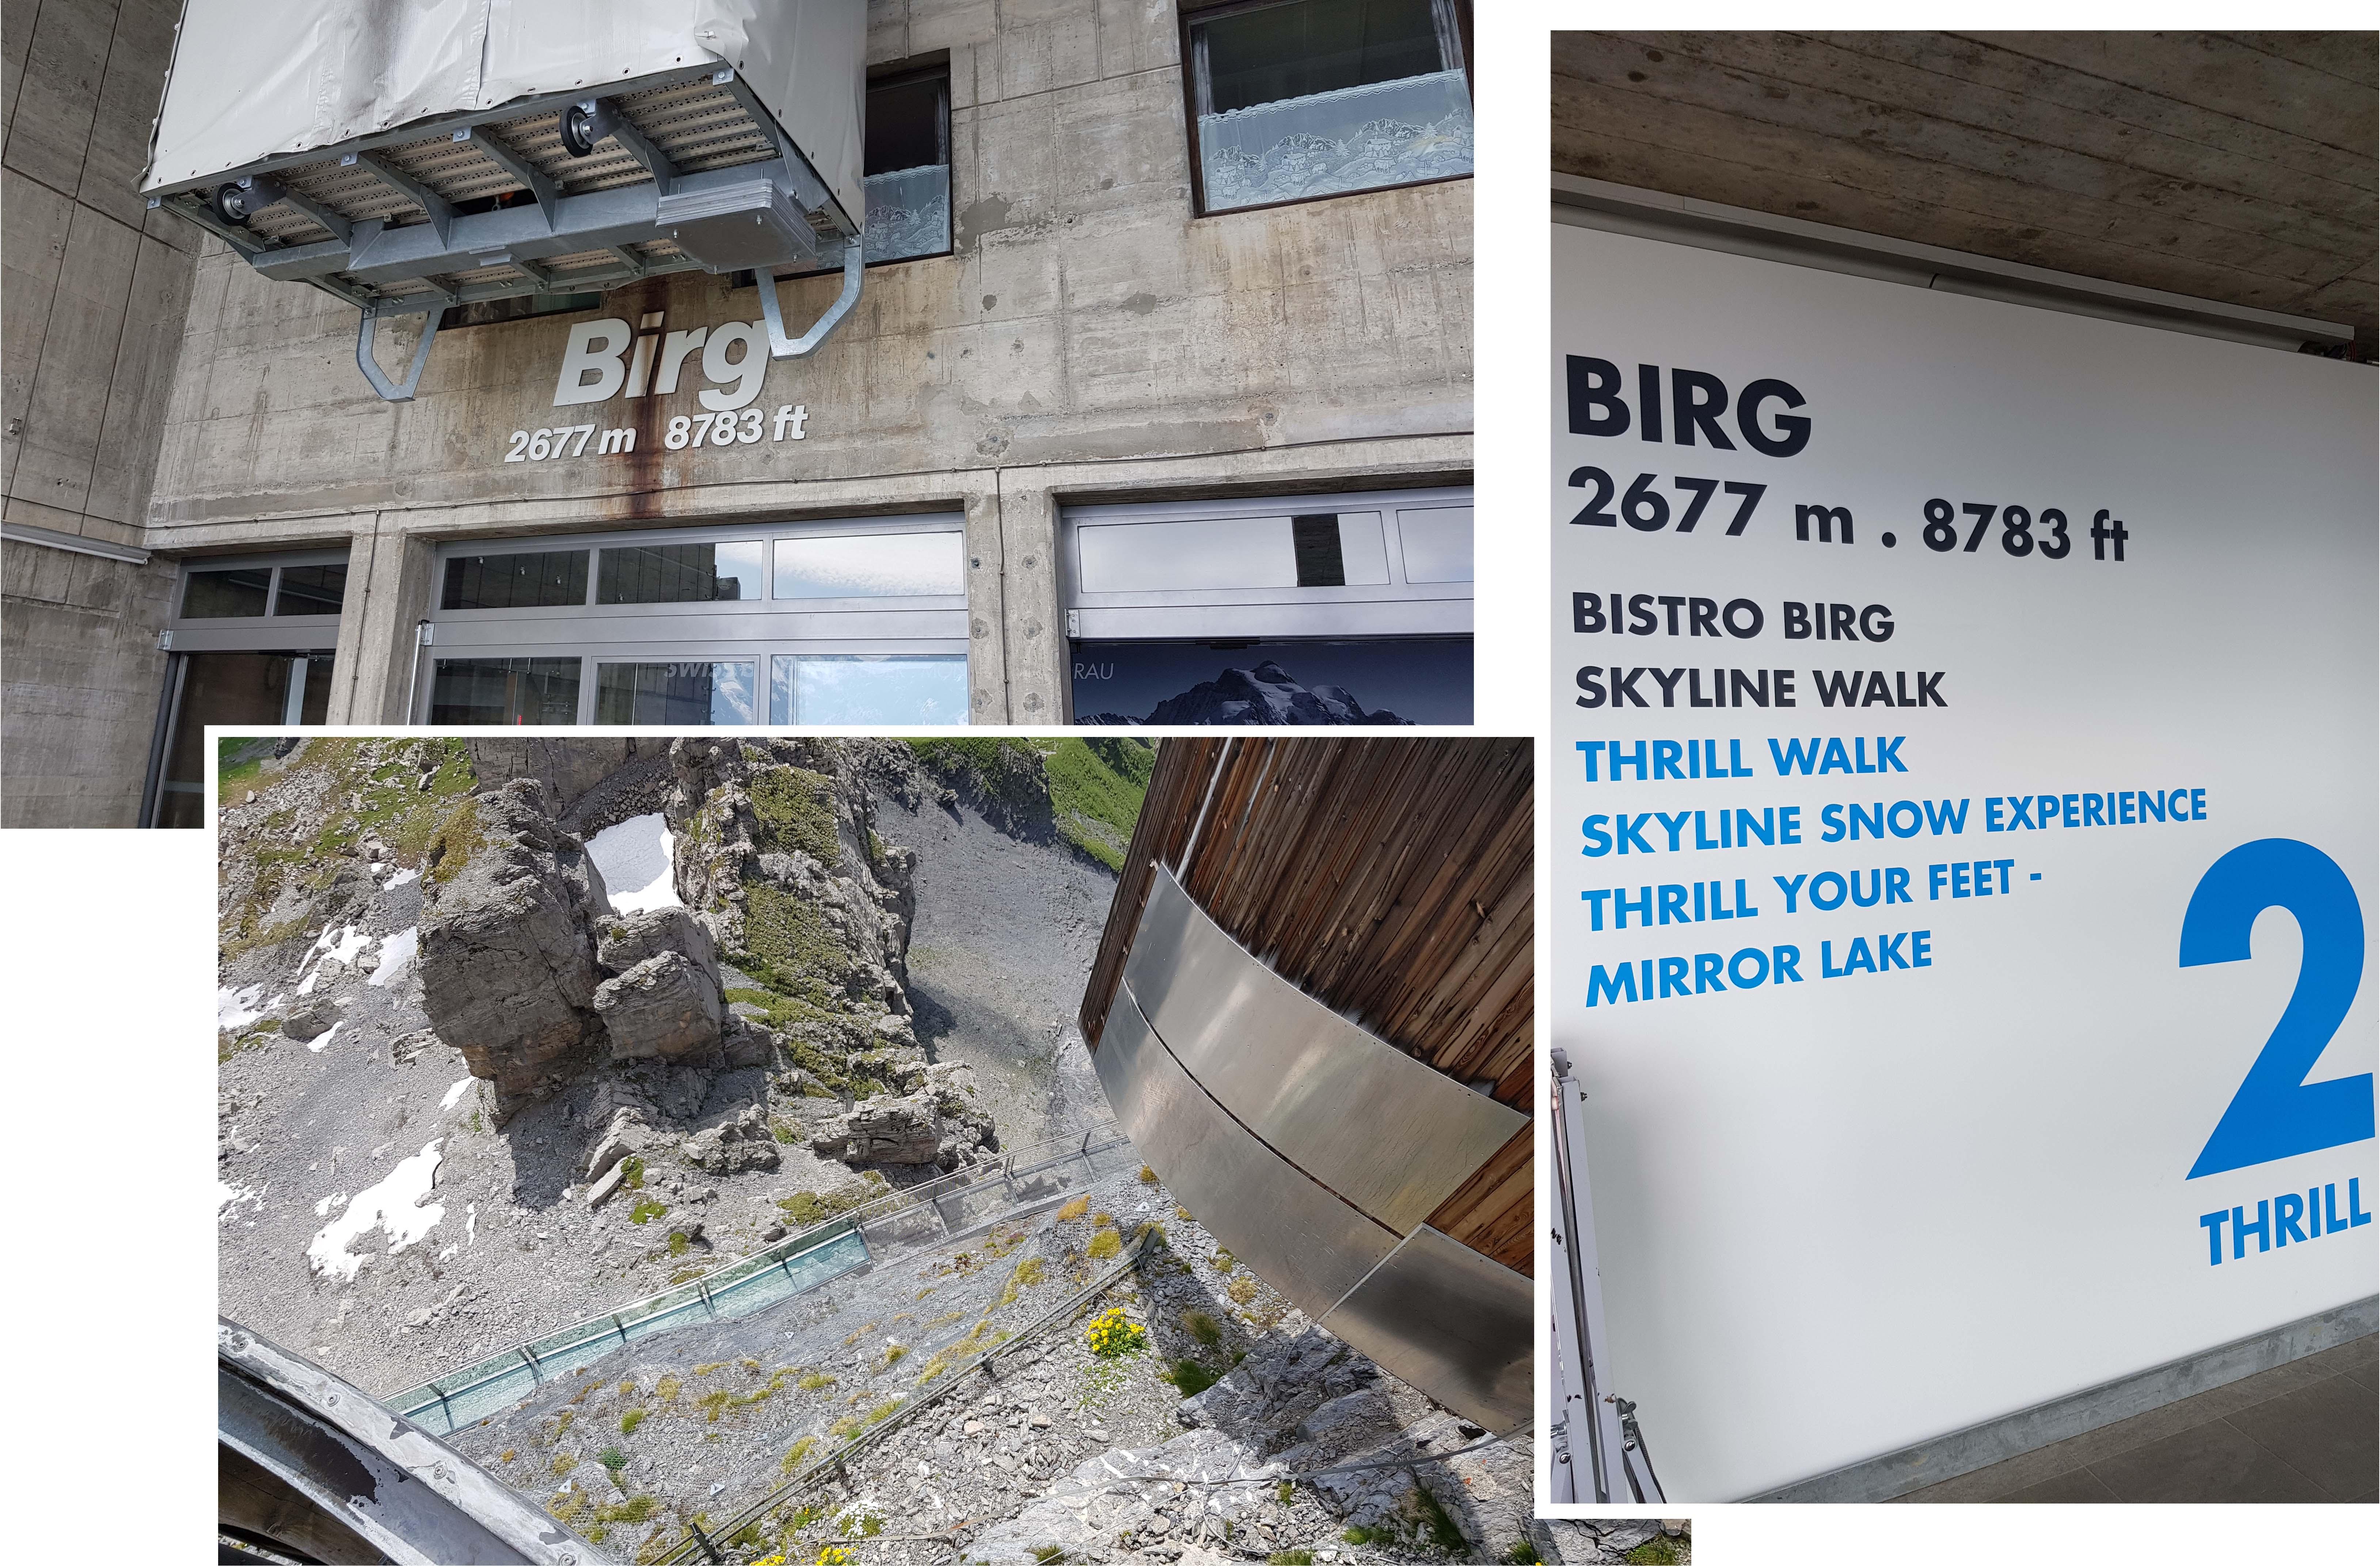 Birg Station